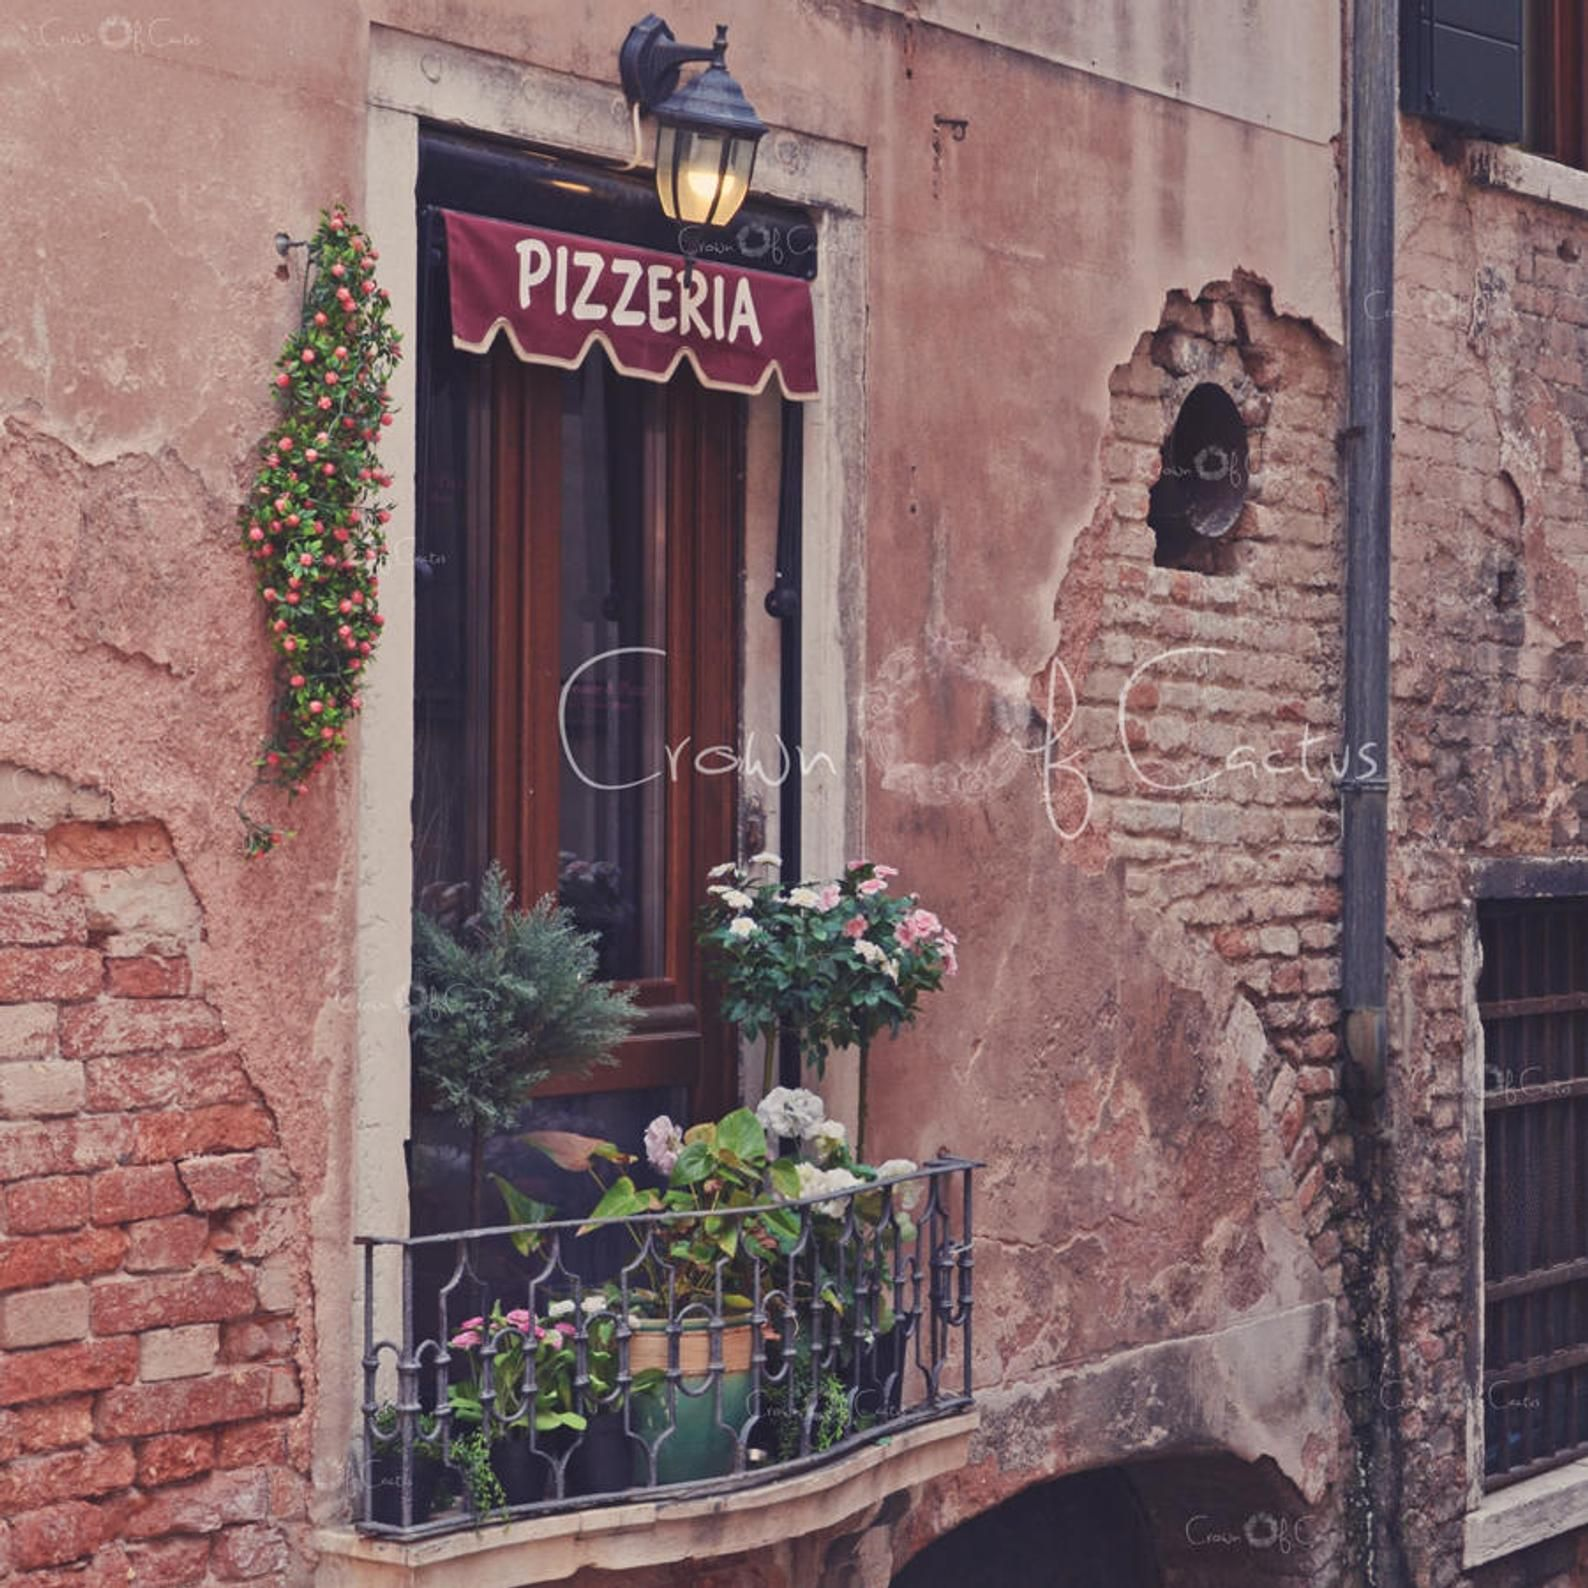 Photo of Pizzeria Venice Italy Old World ~ Instant Digital Download~ Image Print~ Italian Restaurant Photo Wall art decor Kitchen Home Room